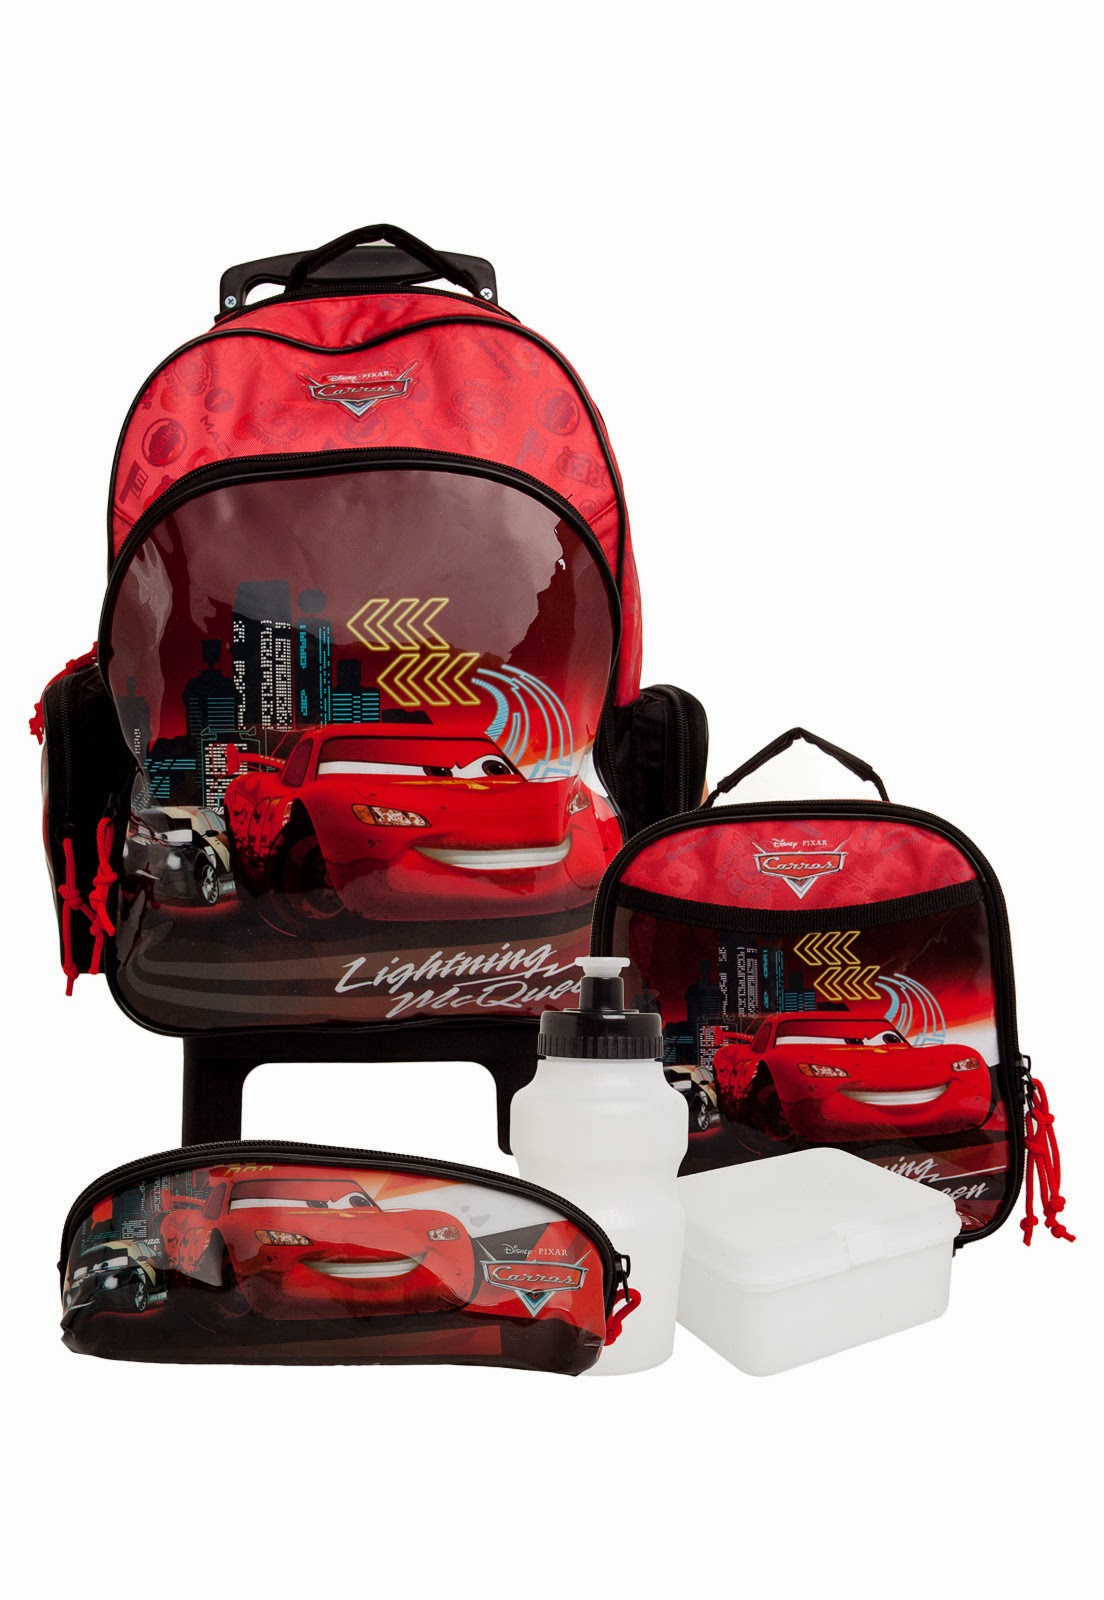 Kit mochilas Volta ás Aulas personagens Carros McQueen vermelho